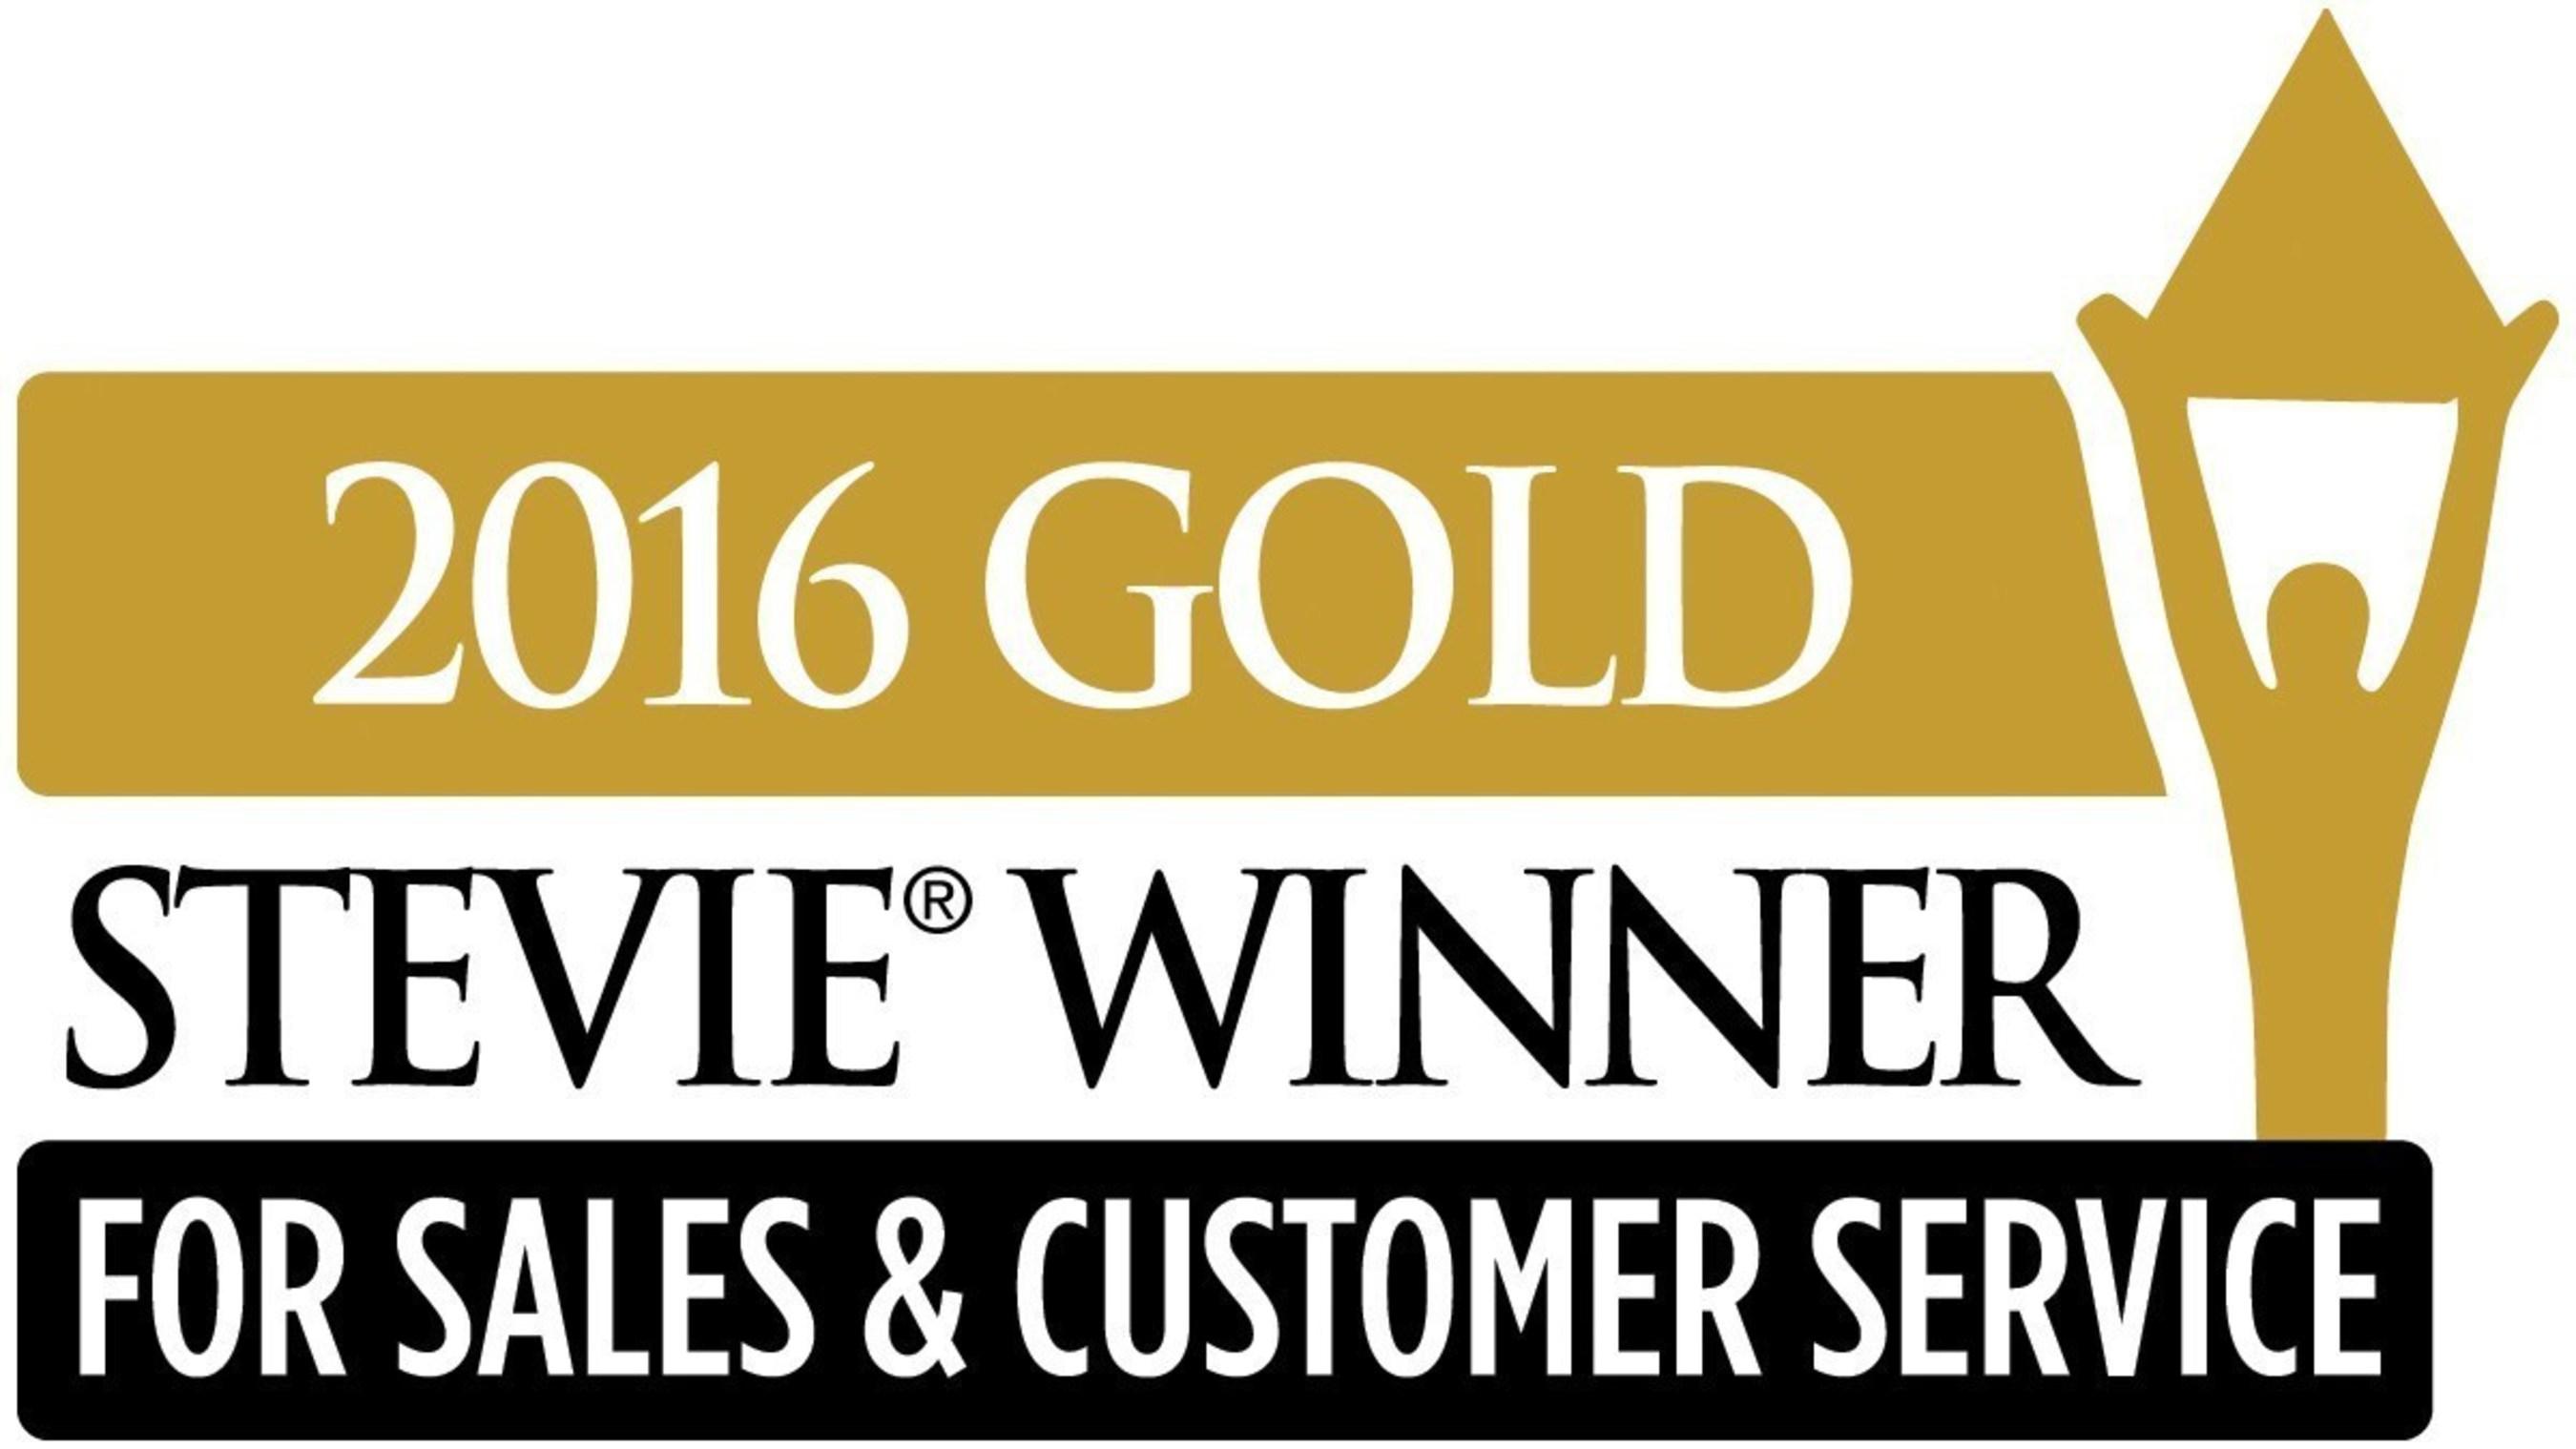 SmartLinx Solutions Wins GOLD at 2016 Stevie Awards